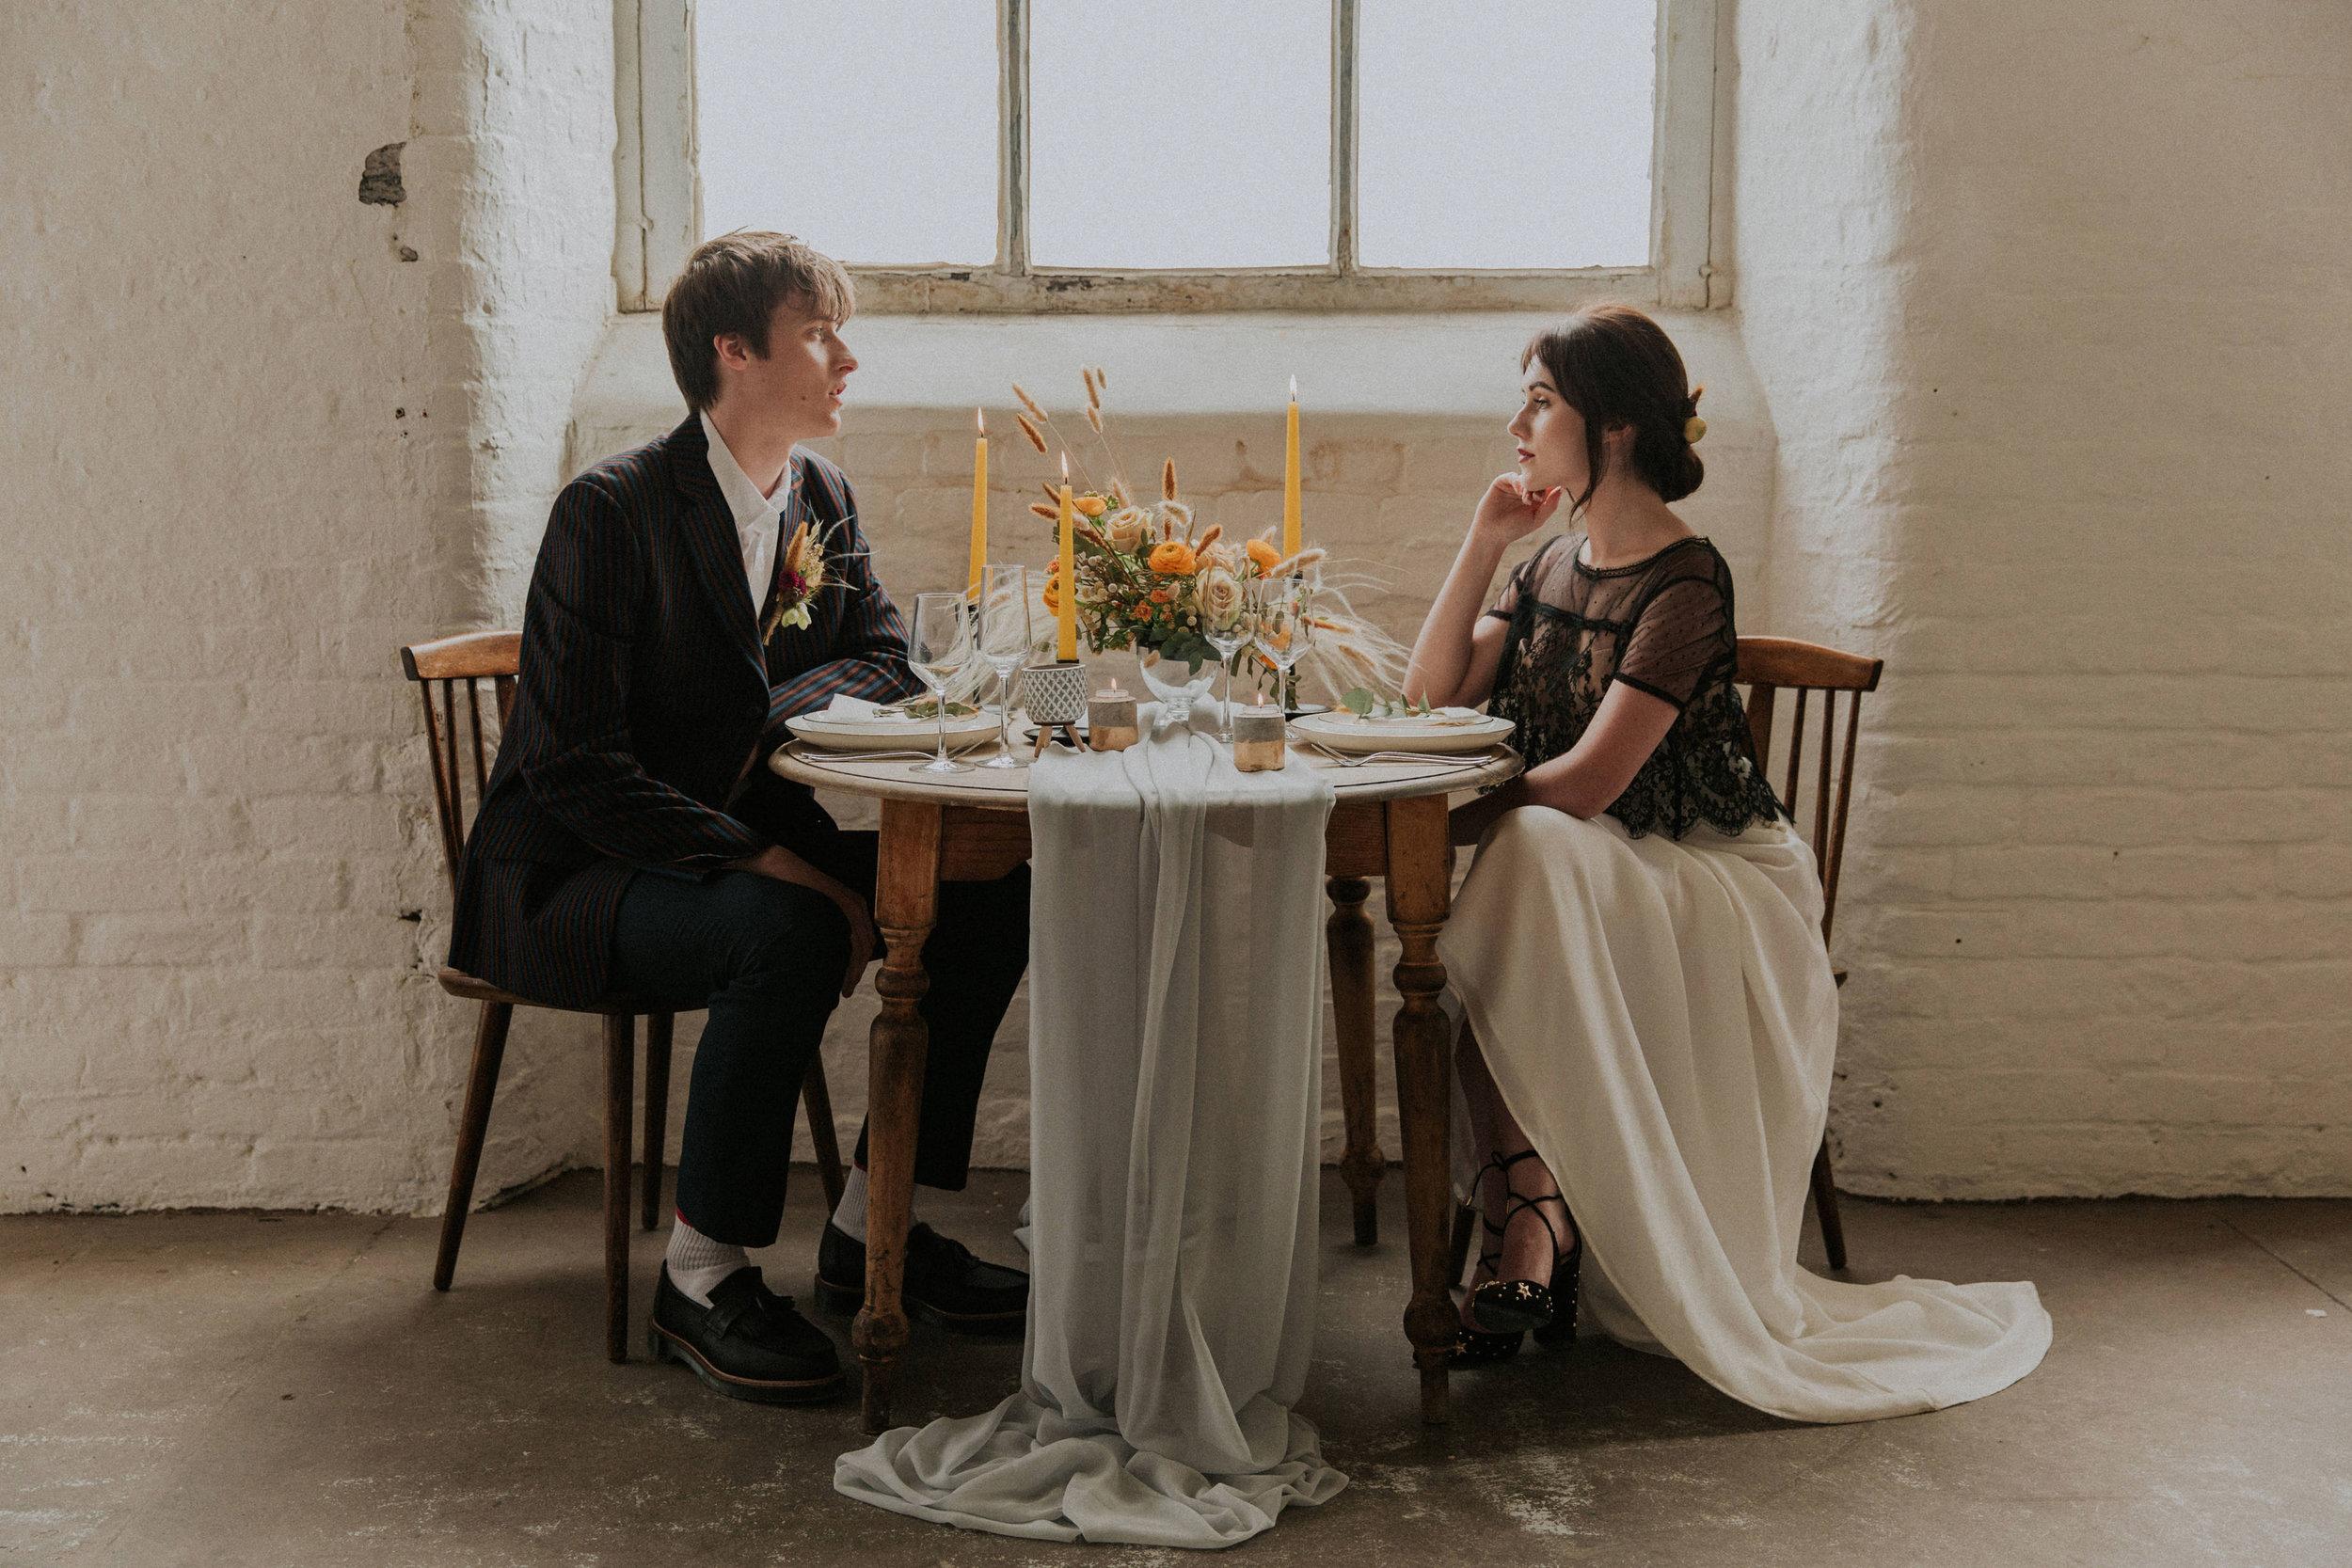 urban industrial styled wedding shoot.jpeg